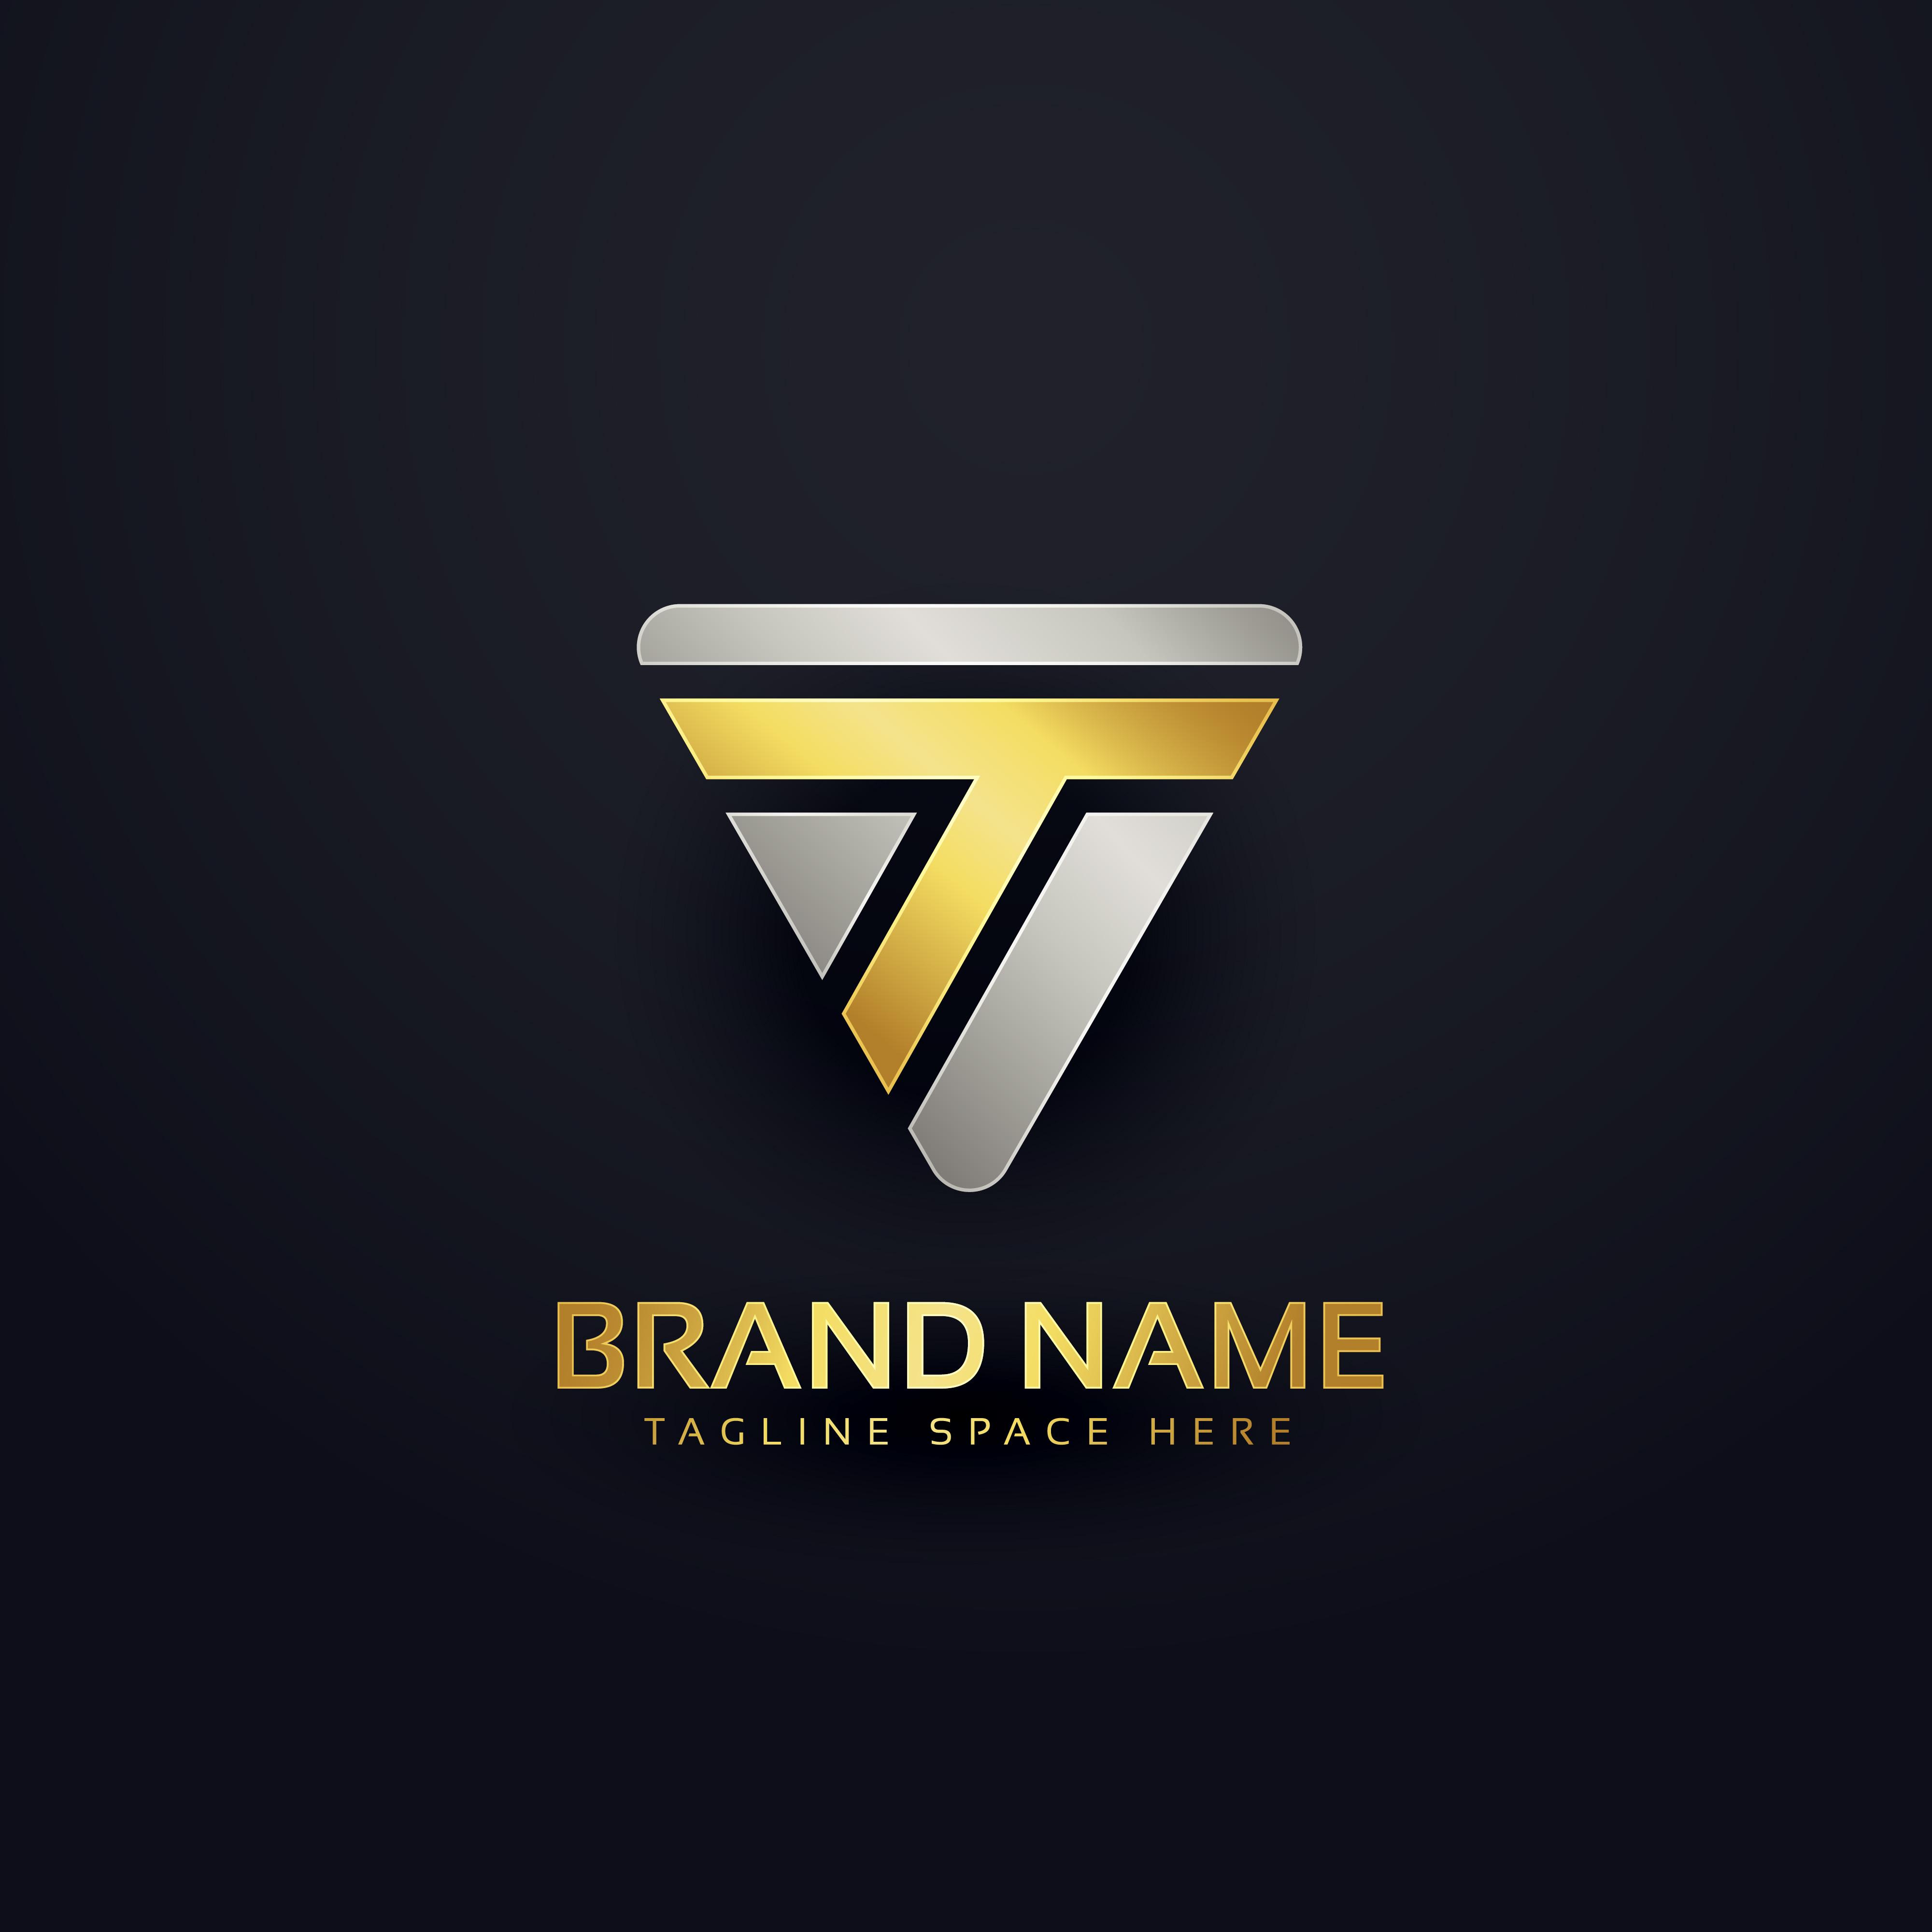 creative letter t logo concept design download free